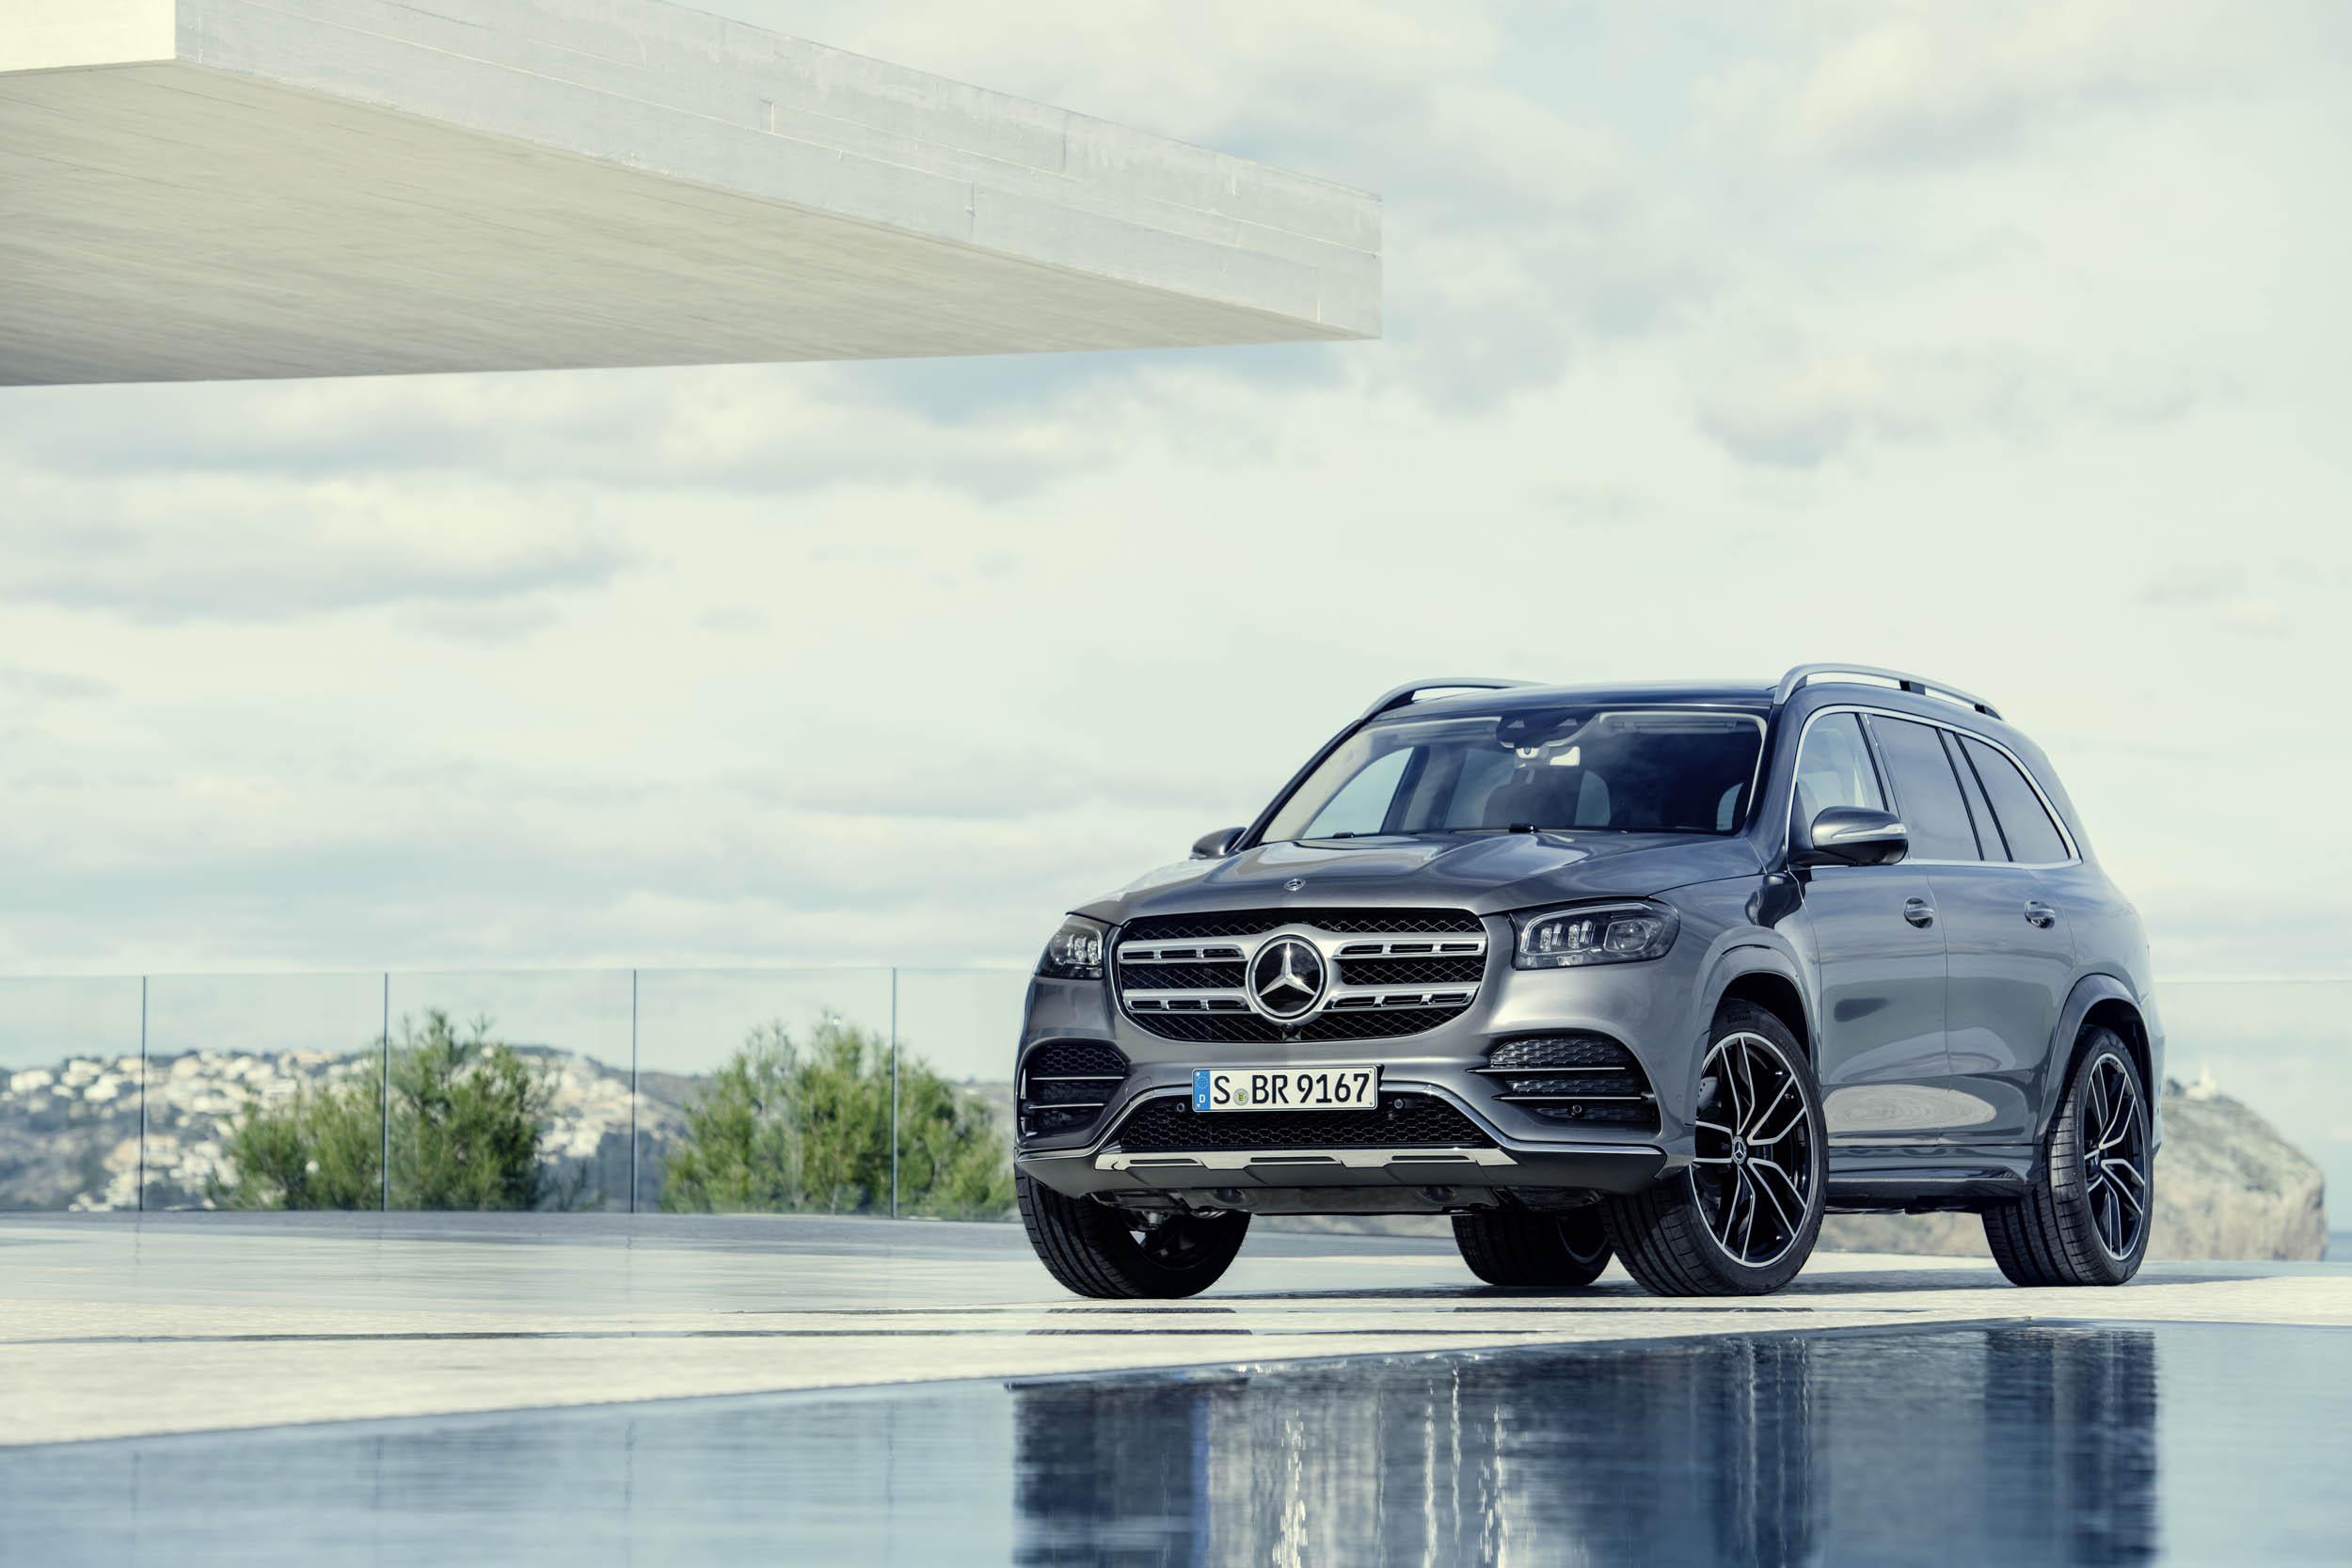 2020 Mercedes – Benz GLS New Engine, Price Updates >> 2020 Mercedes Benz Gls Class Priced From 76 195